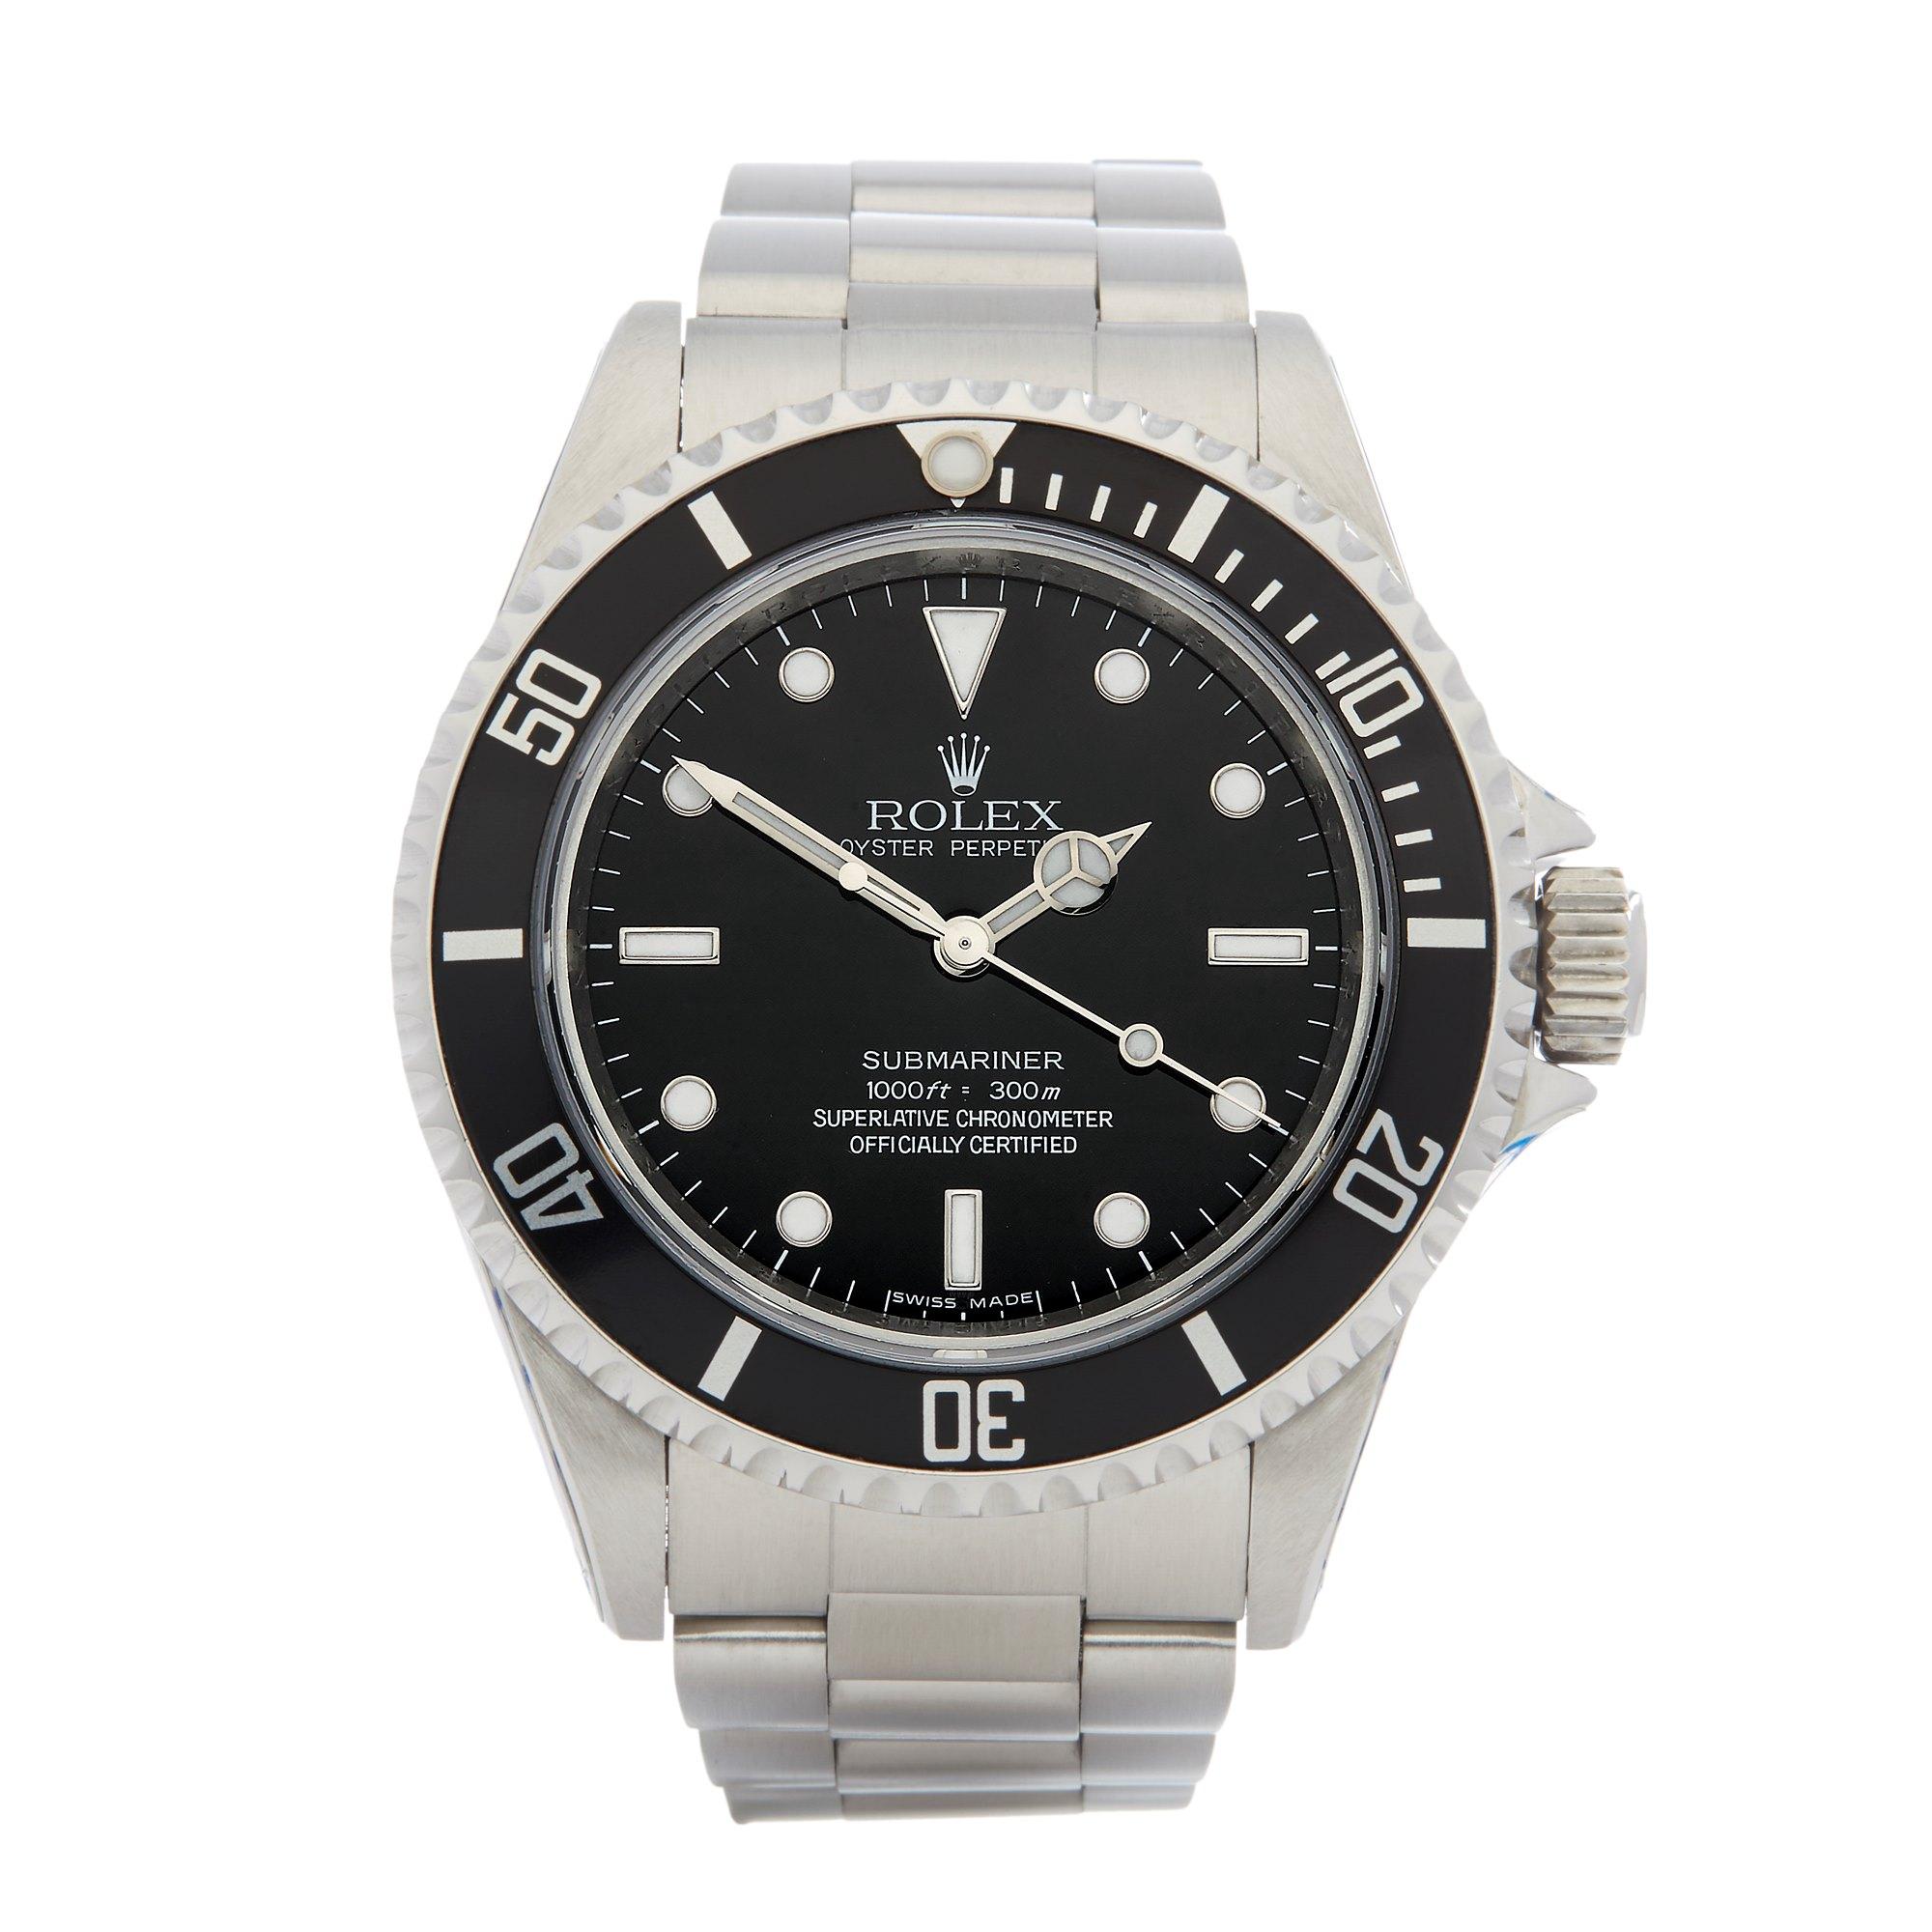 Rolex Submariner Non Date Stainless Steel 14060M